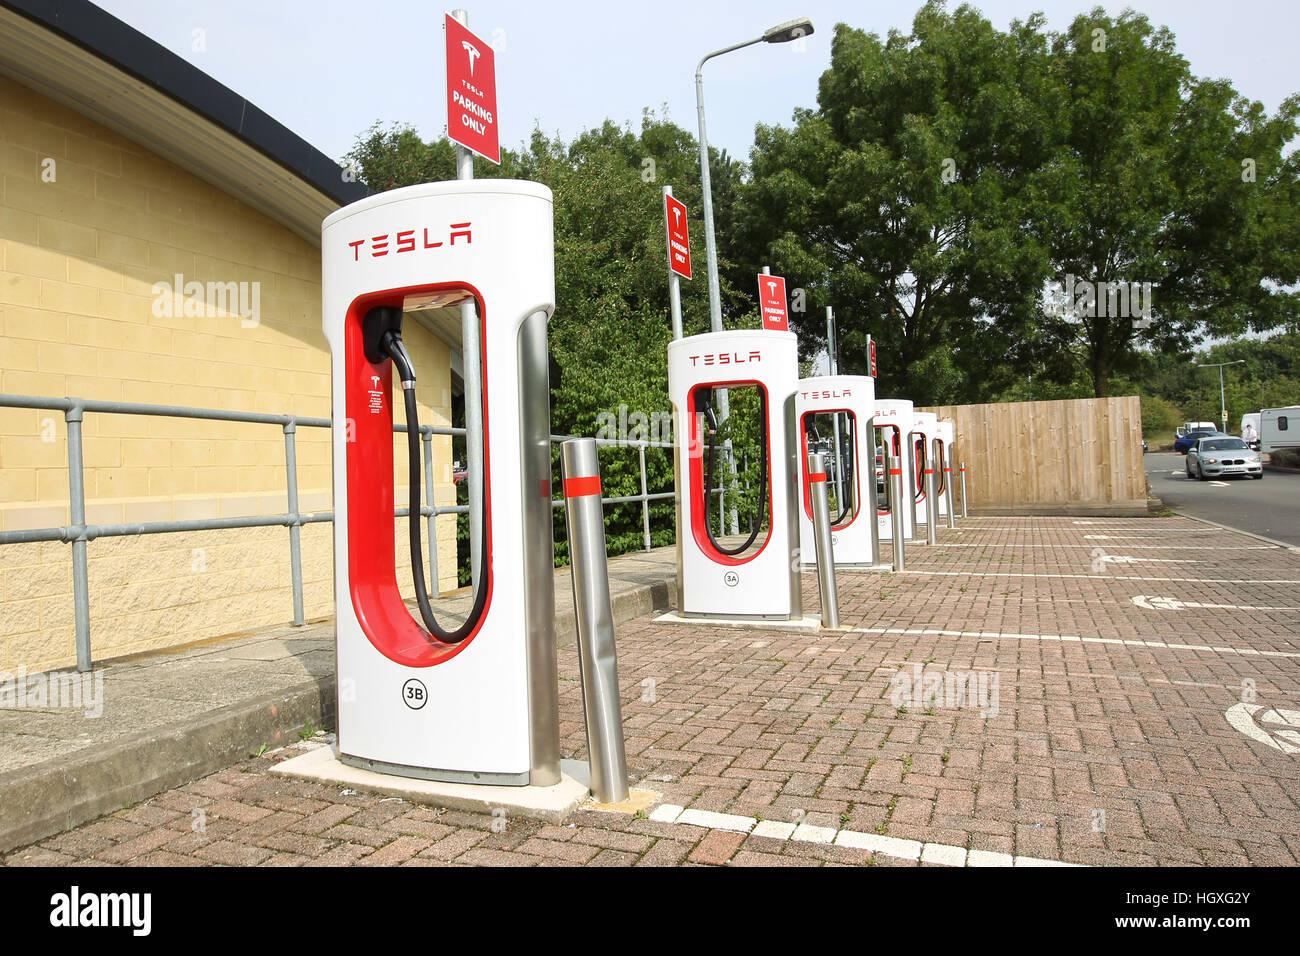 empty tesla electric car vehicle charging stations england uk stock photo royalty free image. Black Bedroom Furniture Sets. Home Design Ideas